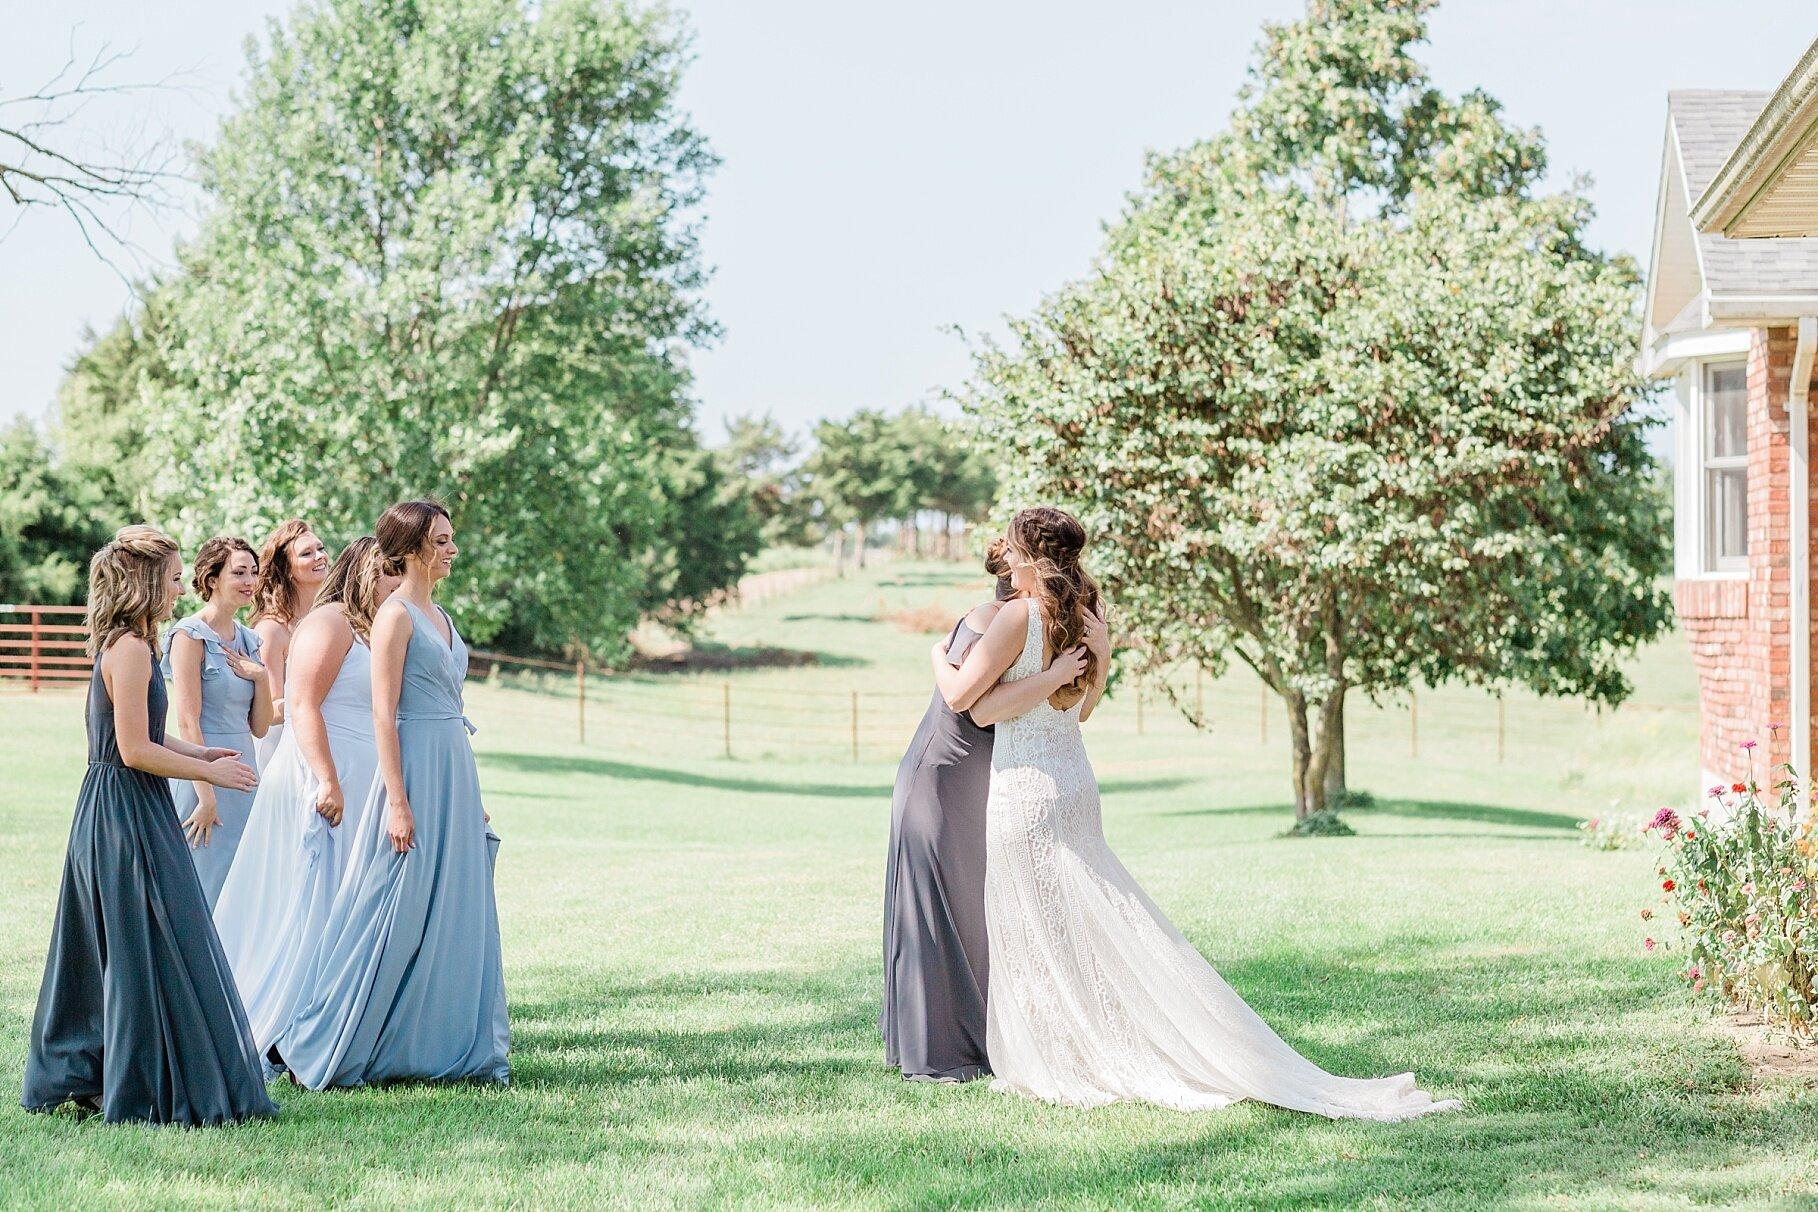 Earth-Toned Wedding by KKP Associate Wedding Photographer and Kelsi Kliethermes Photography Best Columbia Missouri Wedding Photographer_0018.jpg